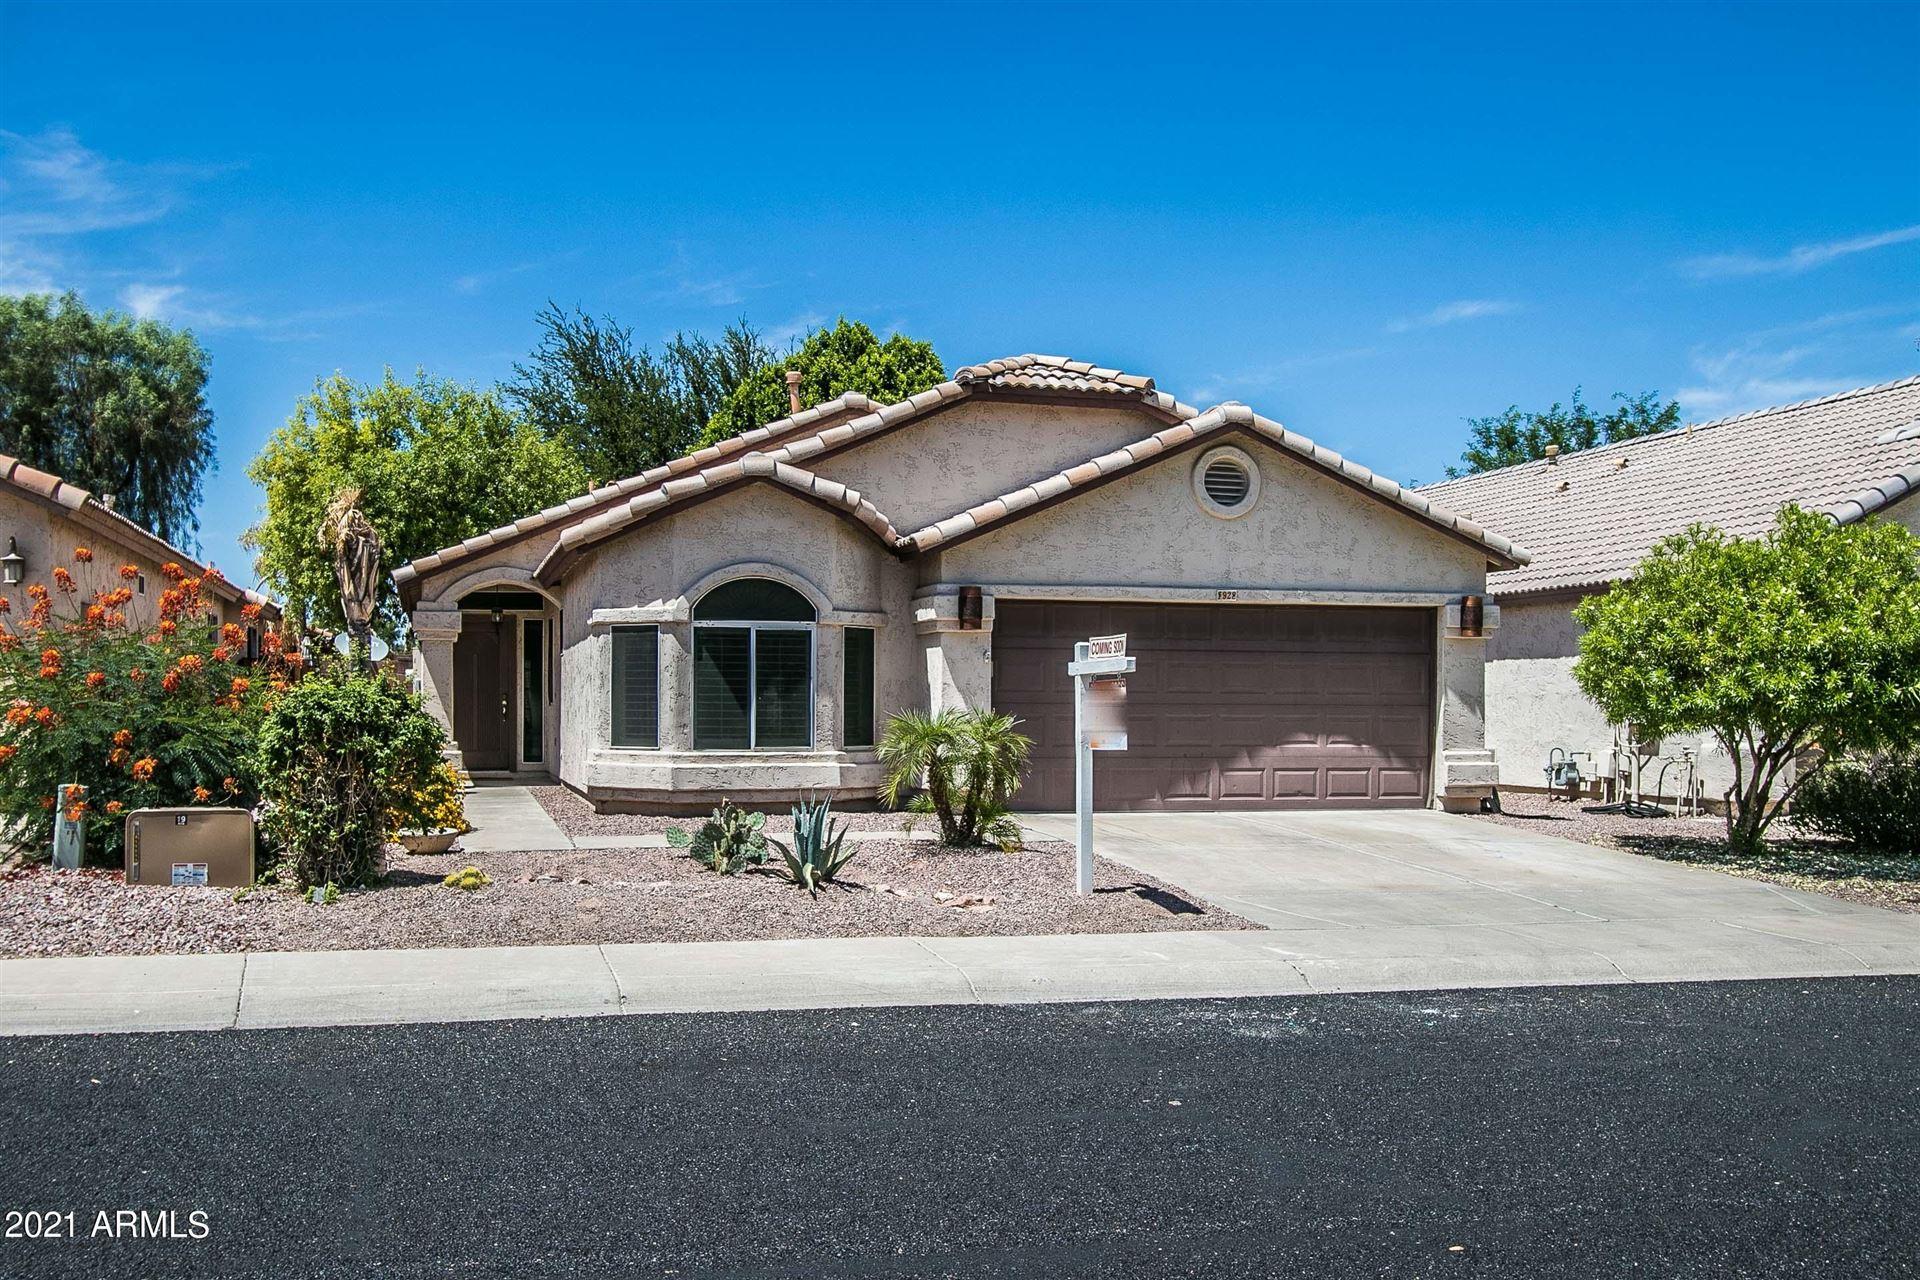 928 E PONTIAC Drive, Phoenix, AZ 85024 - MLS#: 6249633